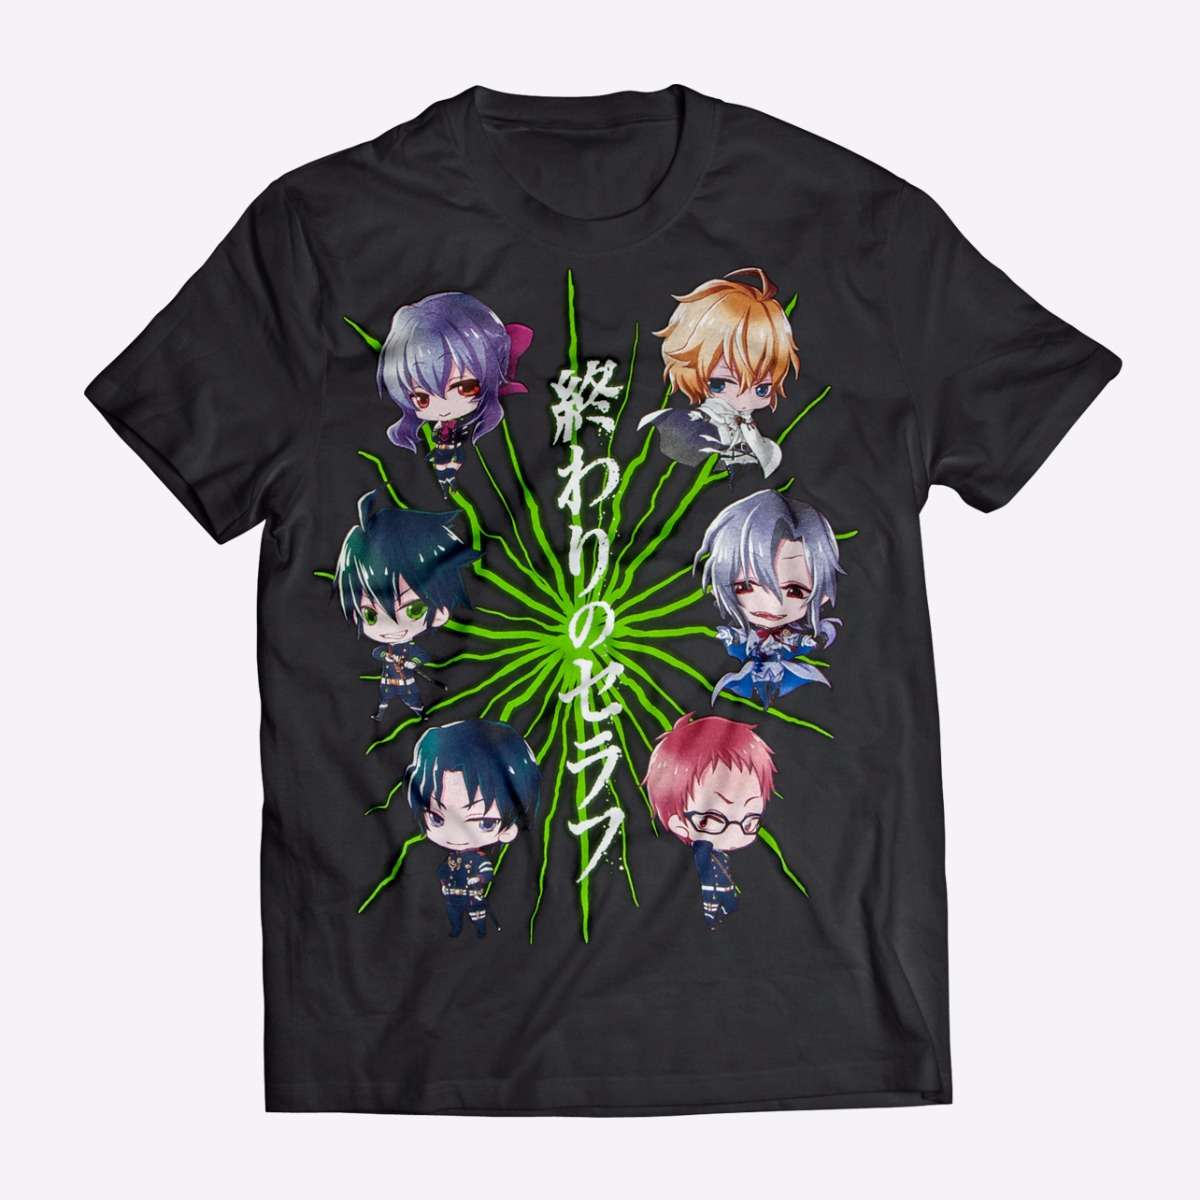 T-Shirt - Chibi apparel